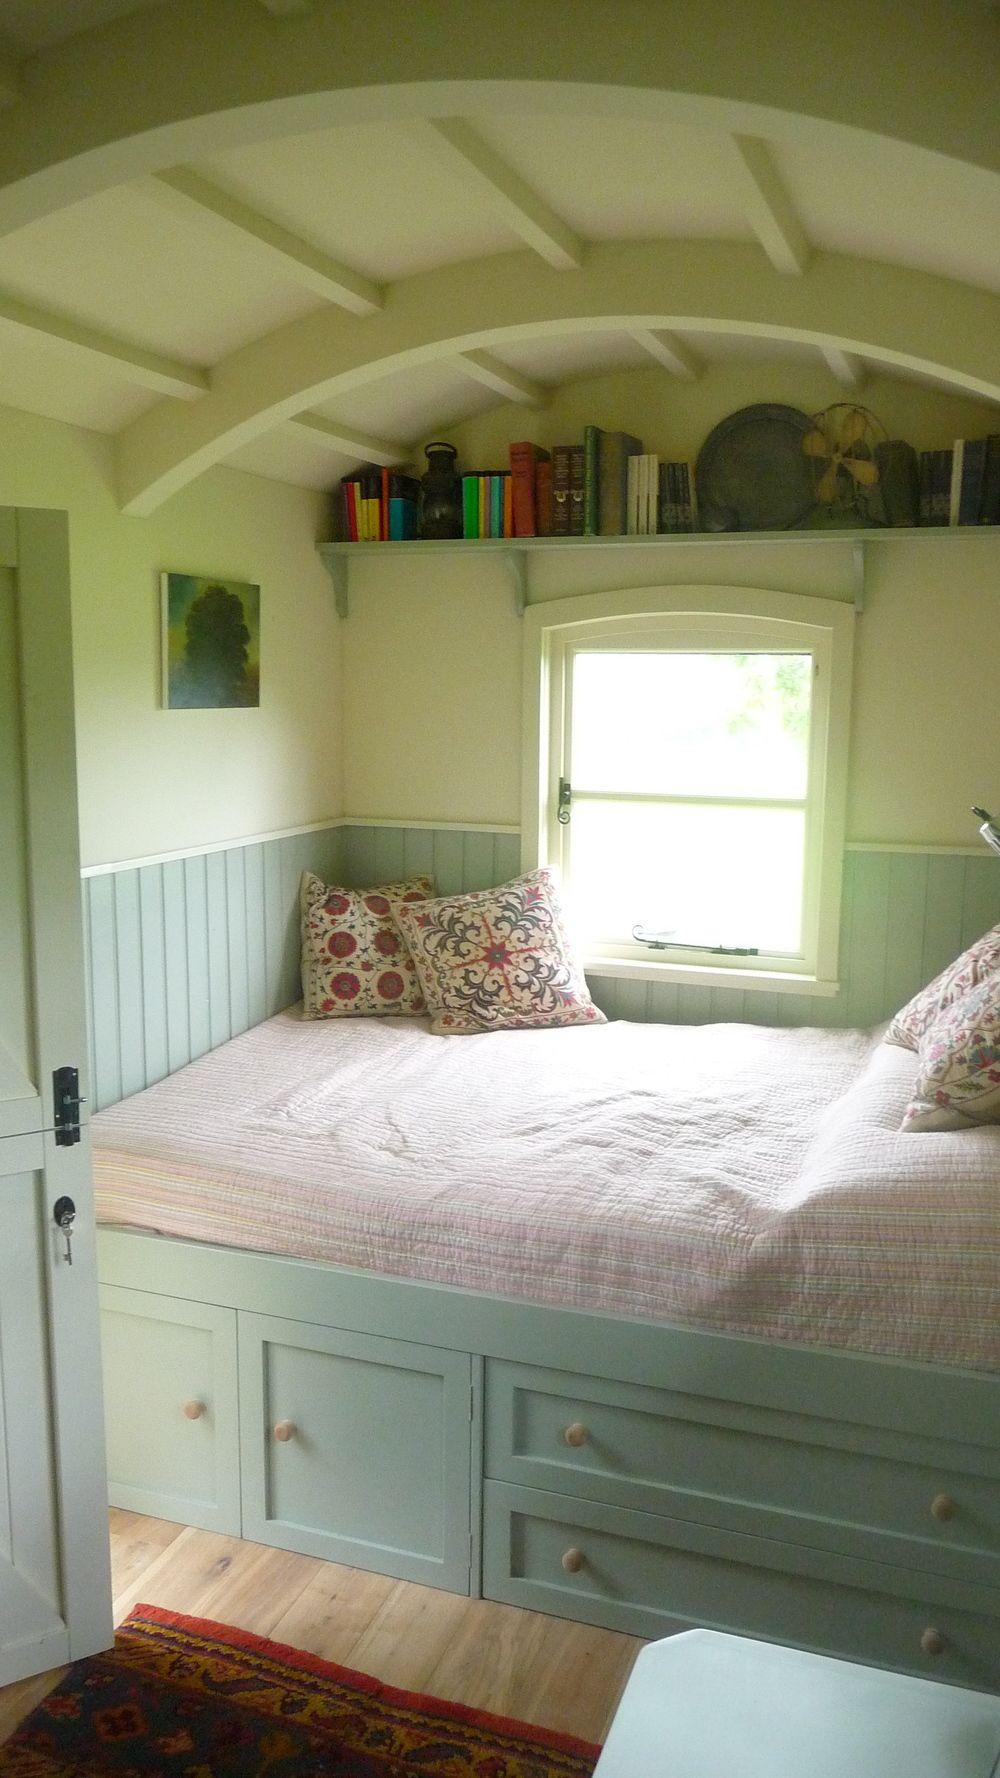 Bed under window  hawthorn hutsu shepherdus hut set in the dorset countryside